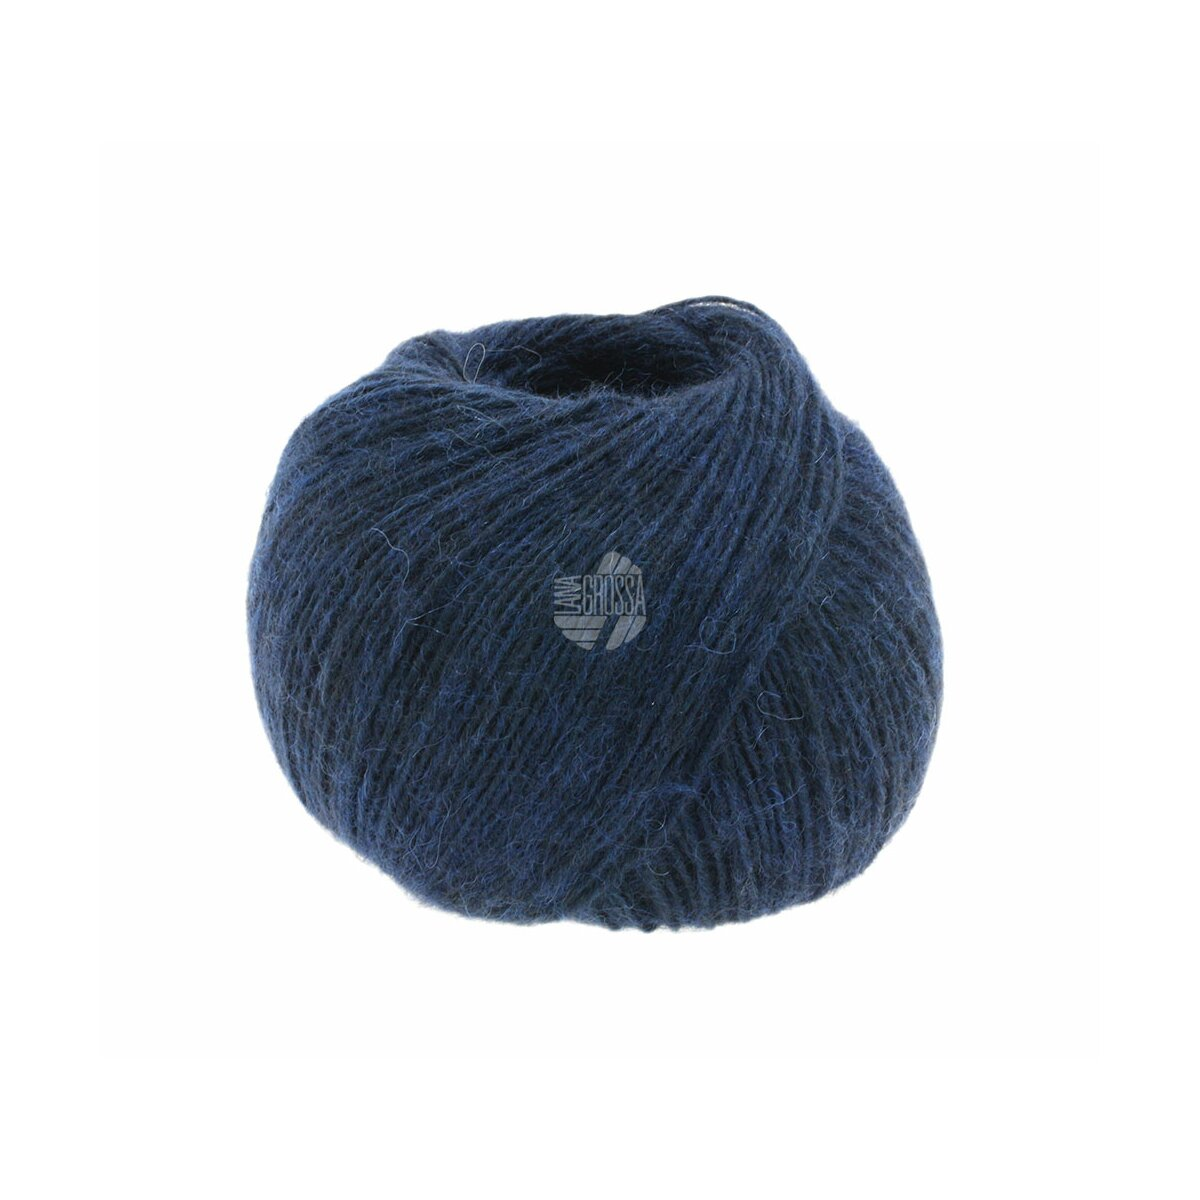 Wolle Kreativ Fb 42 blau 50 g Lana Grossa Ecopuno